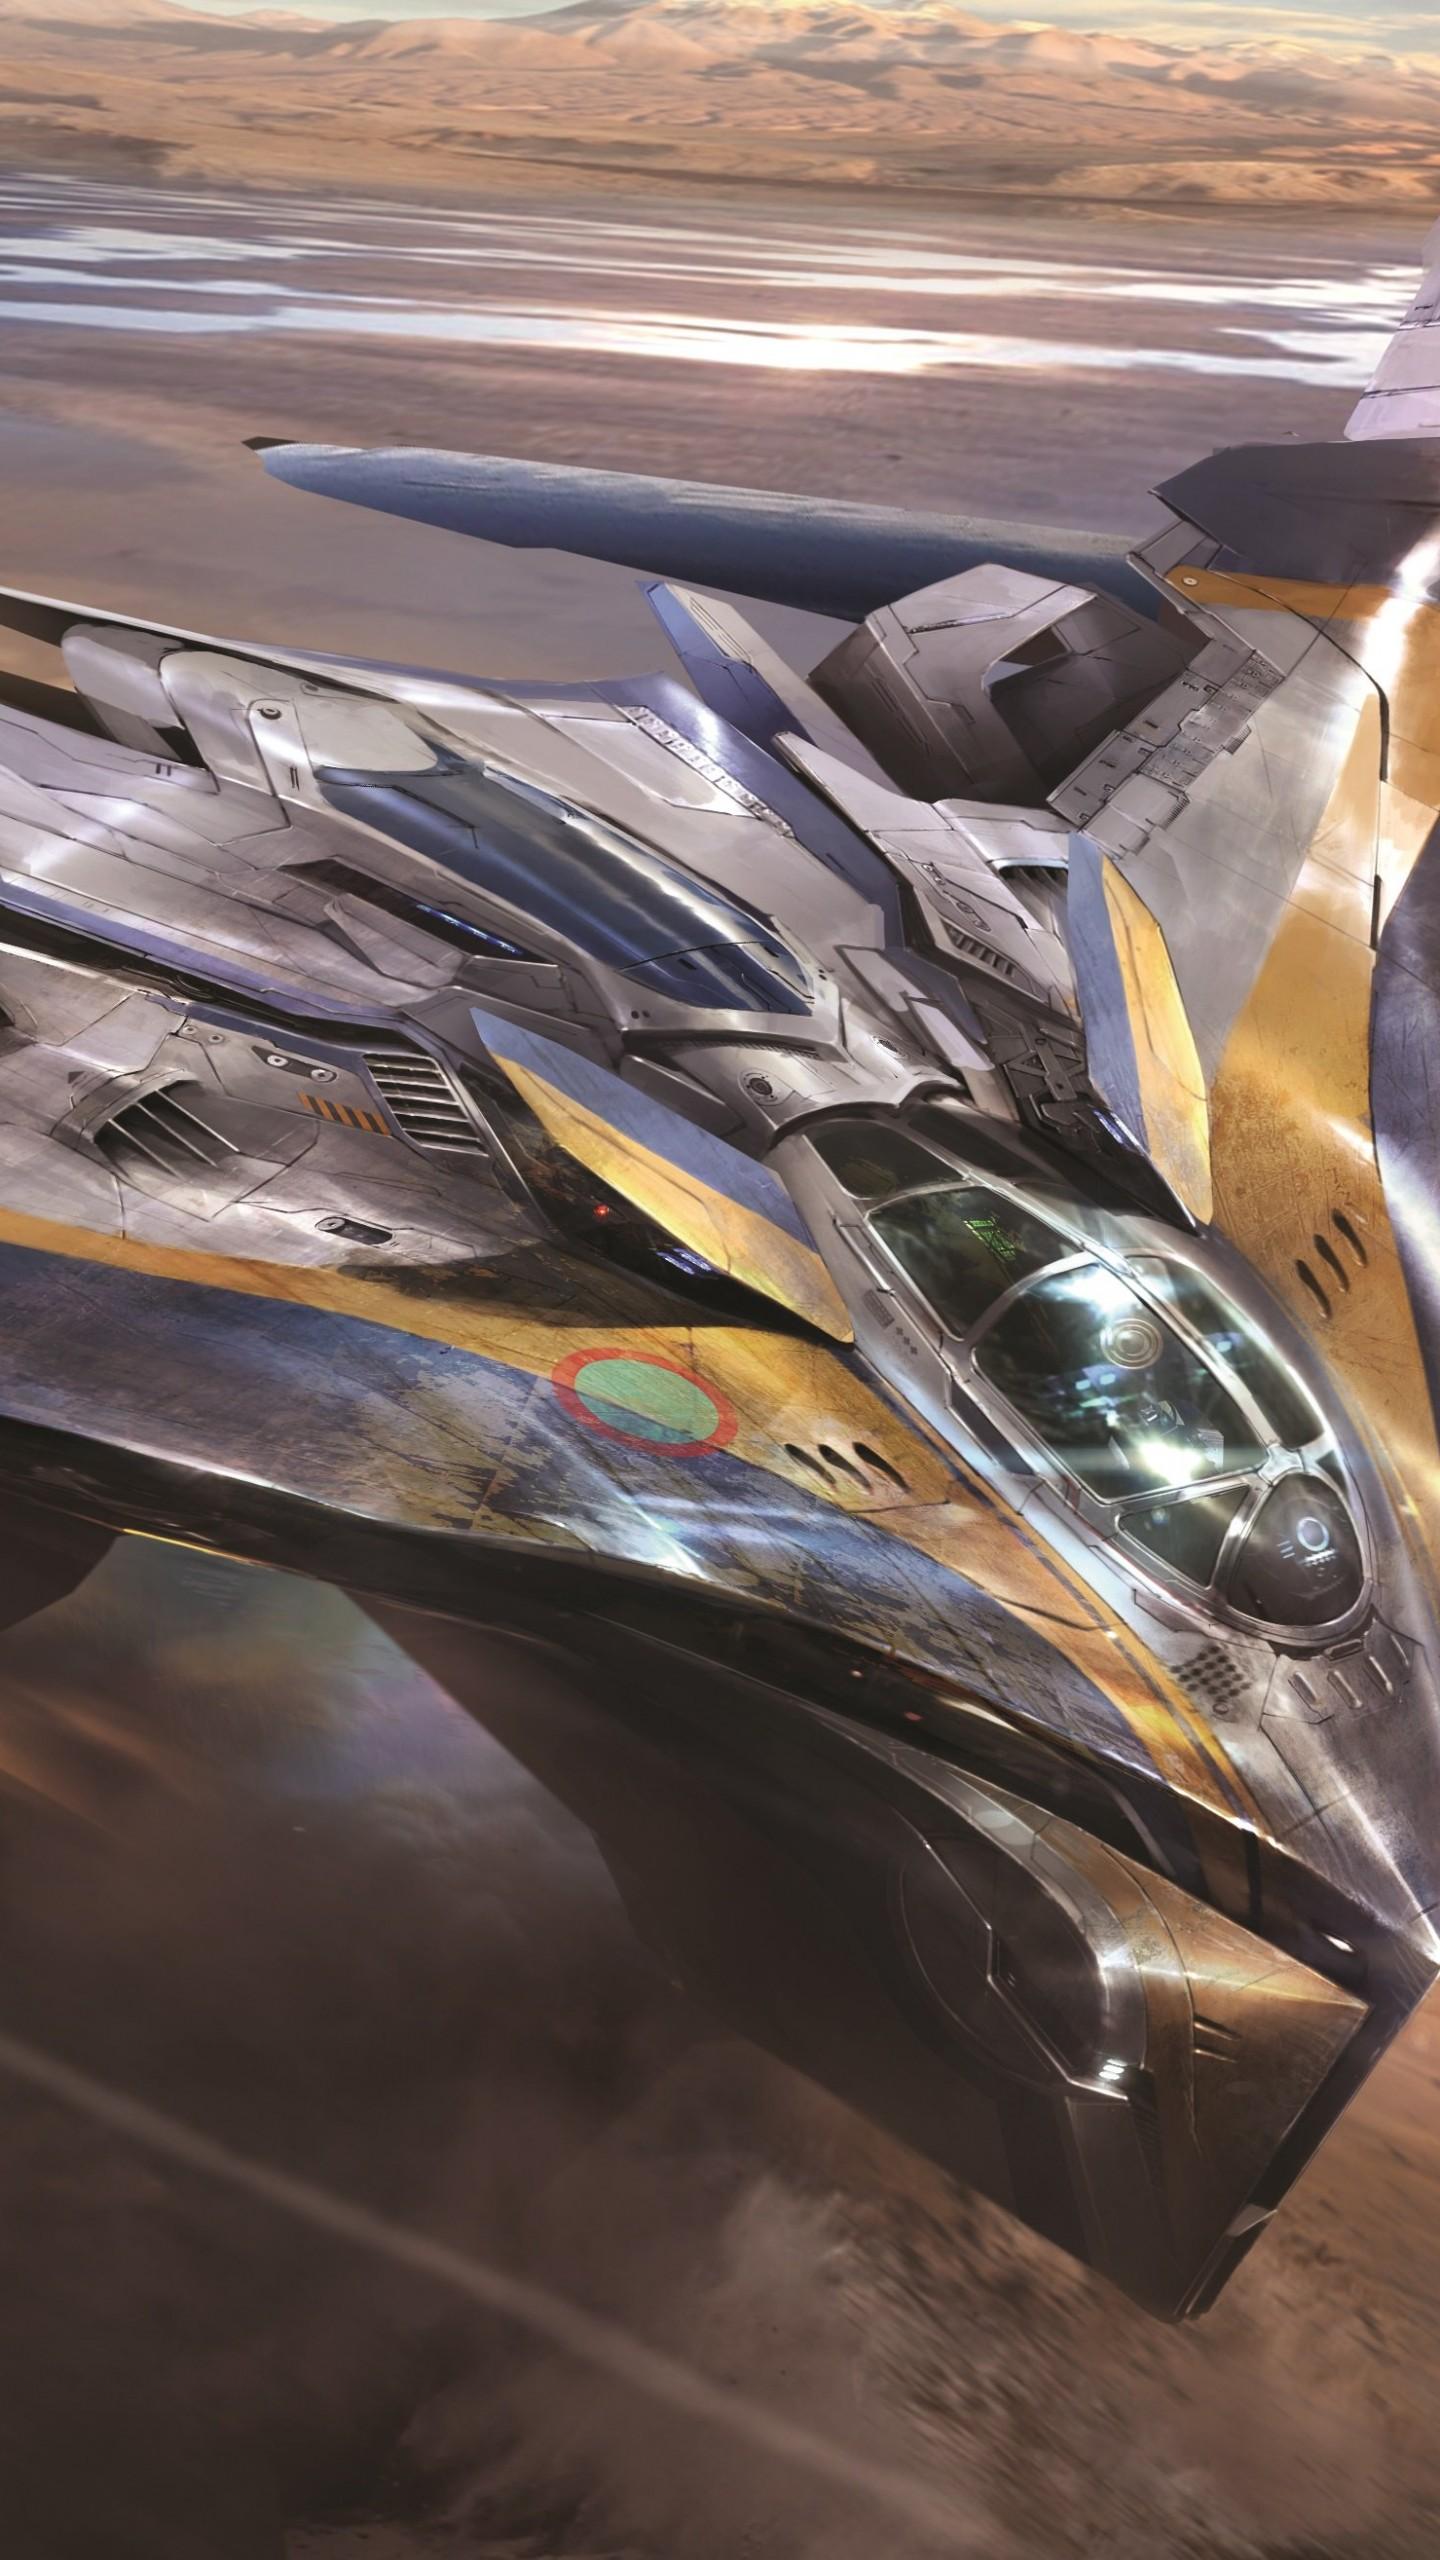 Guardians Of The Galaxy Vol 2 Ship   1440x2560 Wallpaper   teahubio 1440x2560